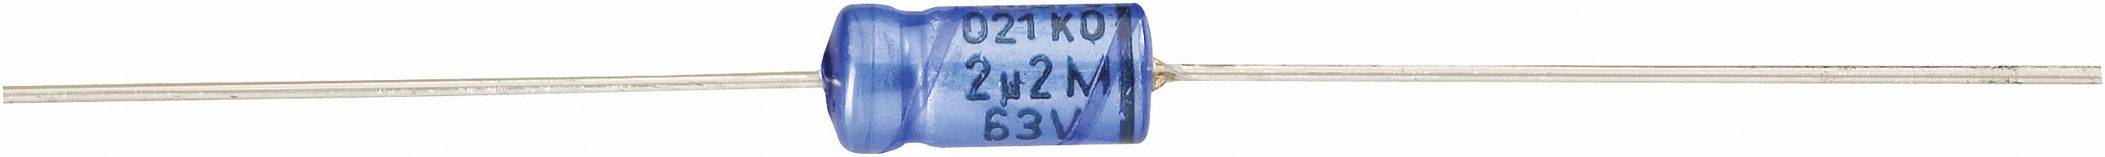 Axiální kondenzátor elektrolytický Vishay 2222 021 28471, 470 µF, 63 V, 20 %, 30 x 12,5 mm